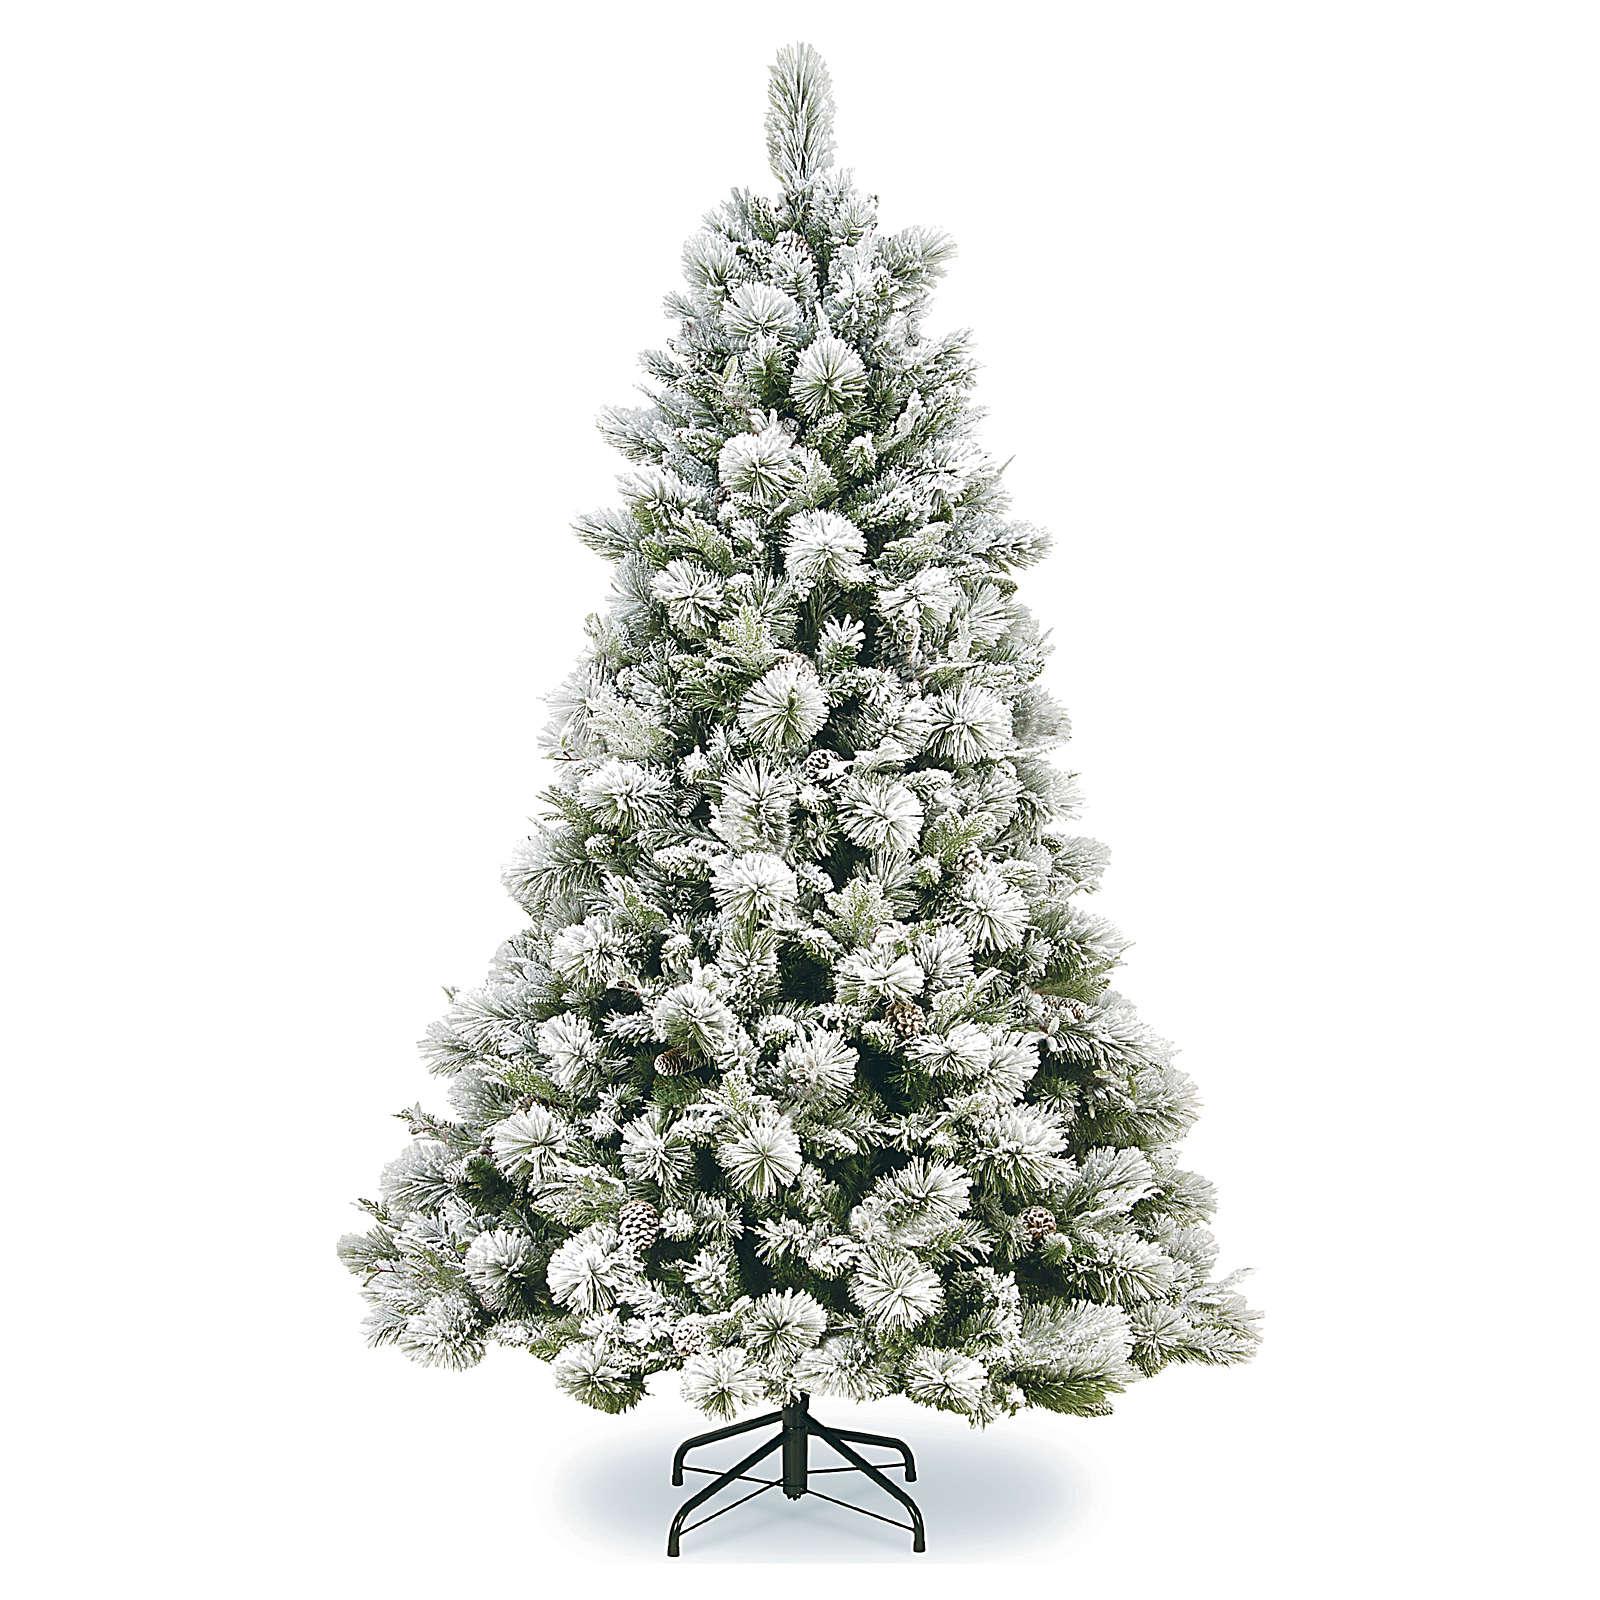 Albero di Natale 180 cm floccato pigne pvc Bedford 3